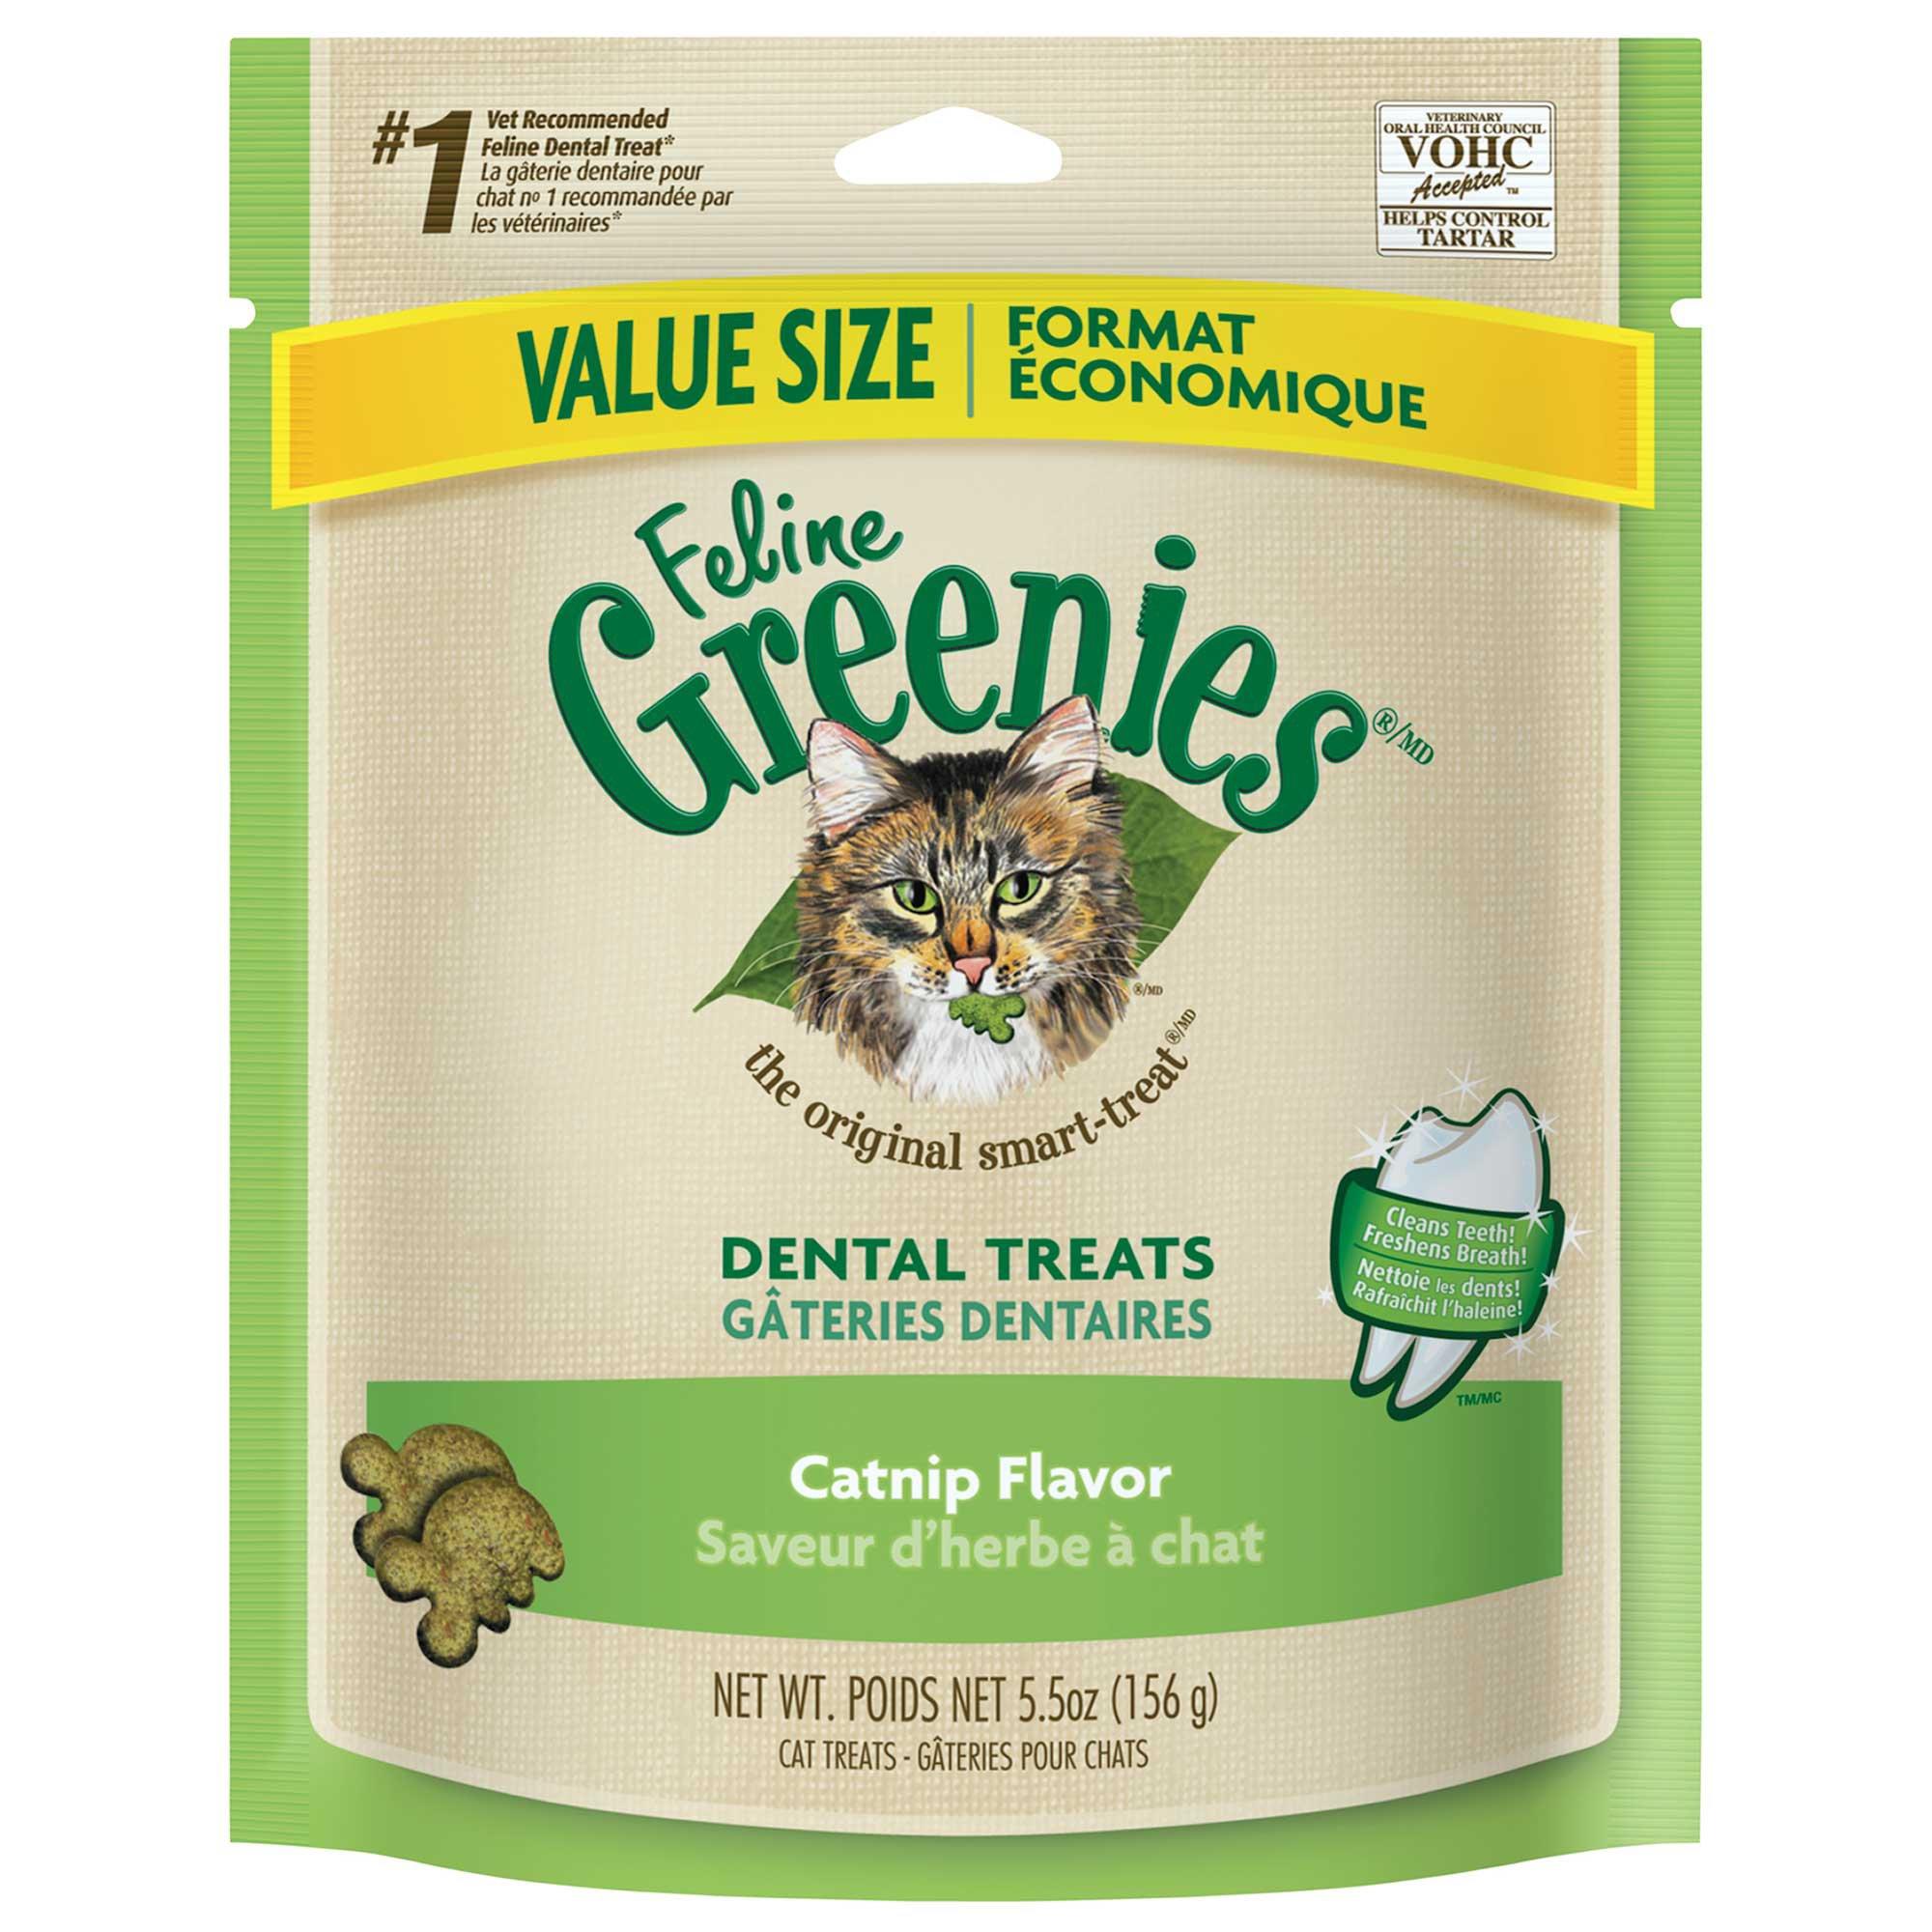 Noxious Dental Care Tips Oral Hygiene Oralcarepro Dentalcarecavities Dental Treats Greenies Cat Treats